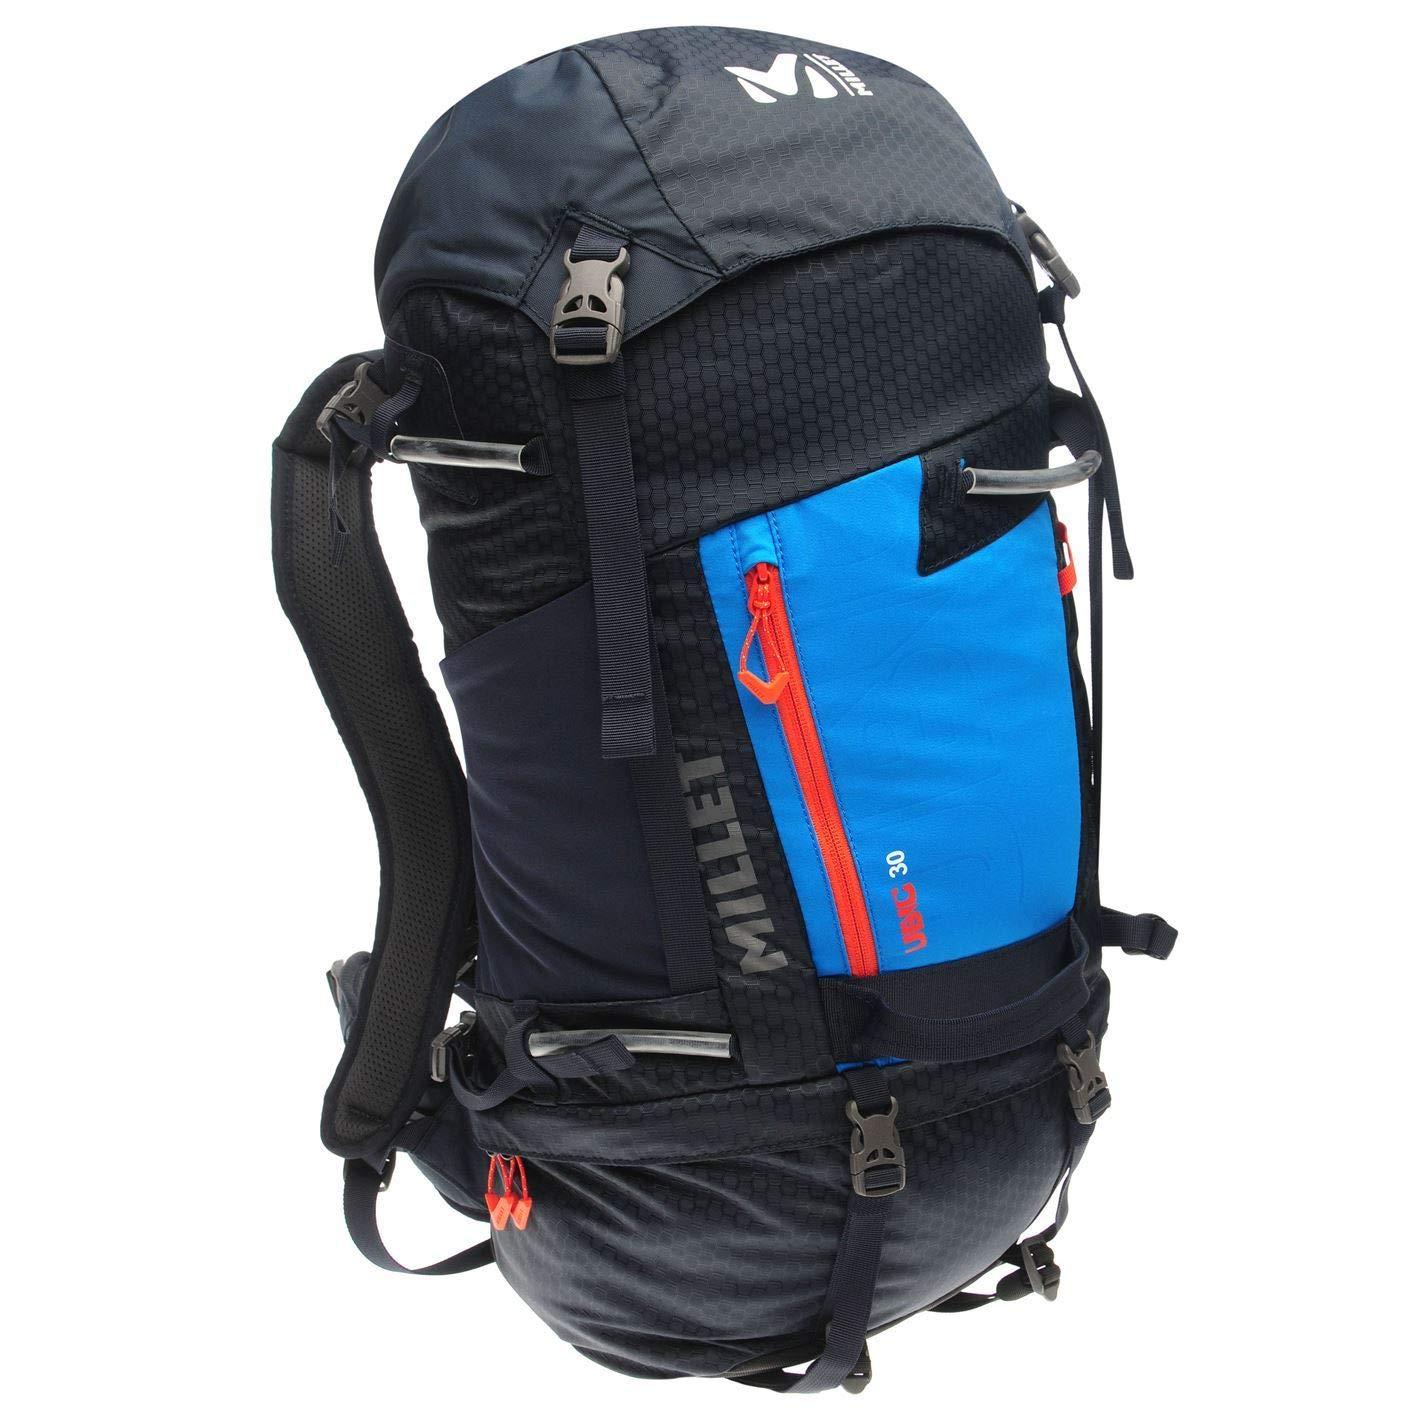 b6842c1c1 Ubic 30 Litre Navy blueee Millet Backpacks Ubic greentigo Elium 20L 30L 35L  40L Rucksack Daypack Matrix 25L nwznlm7344-Internal Frame Hiking Backpacks